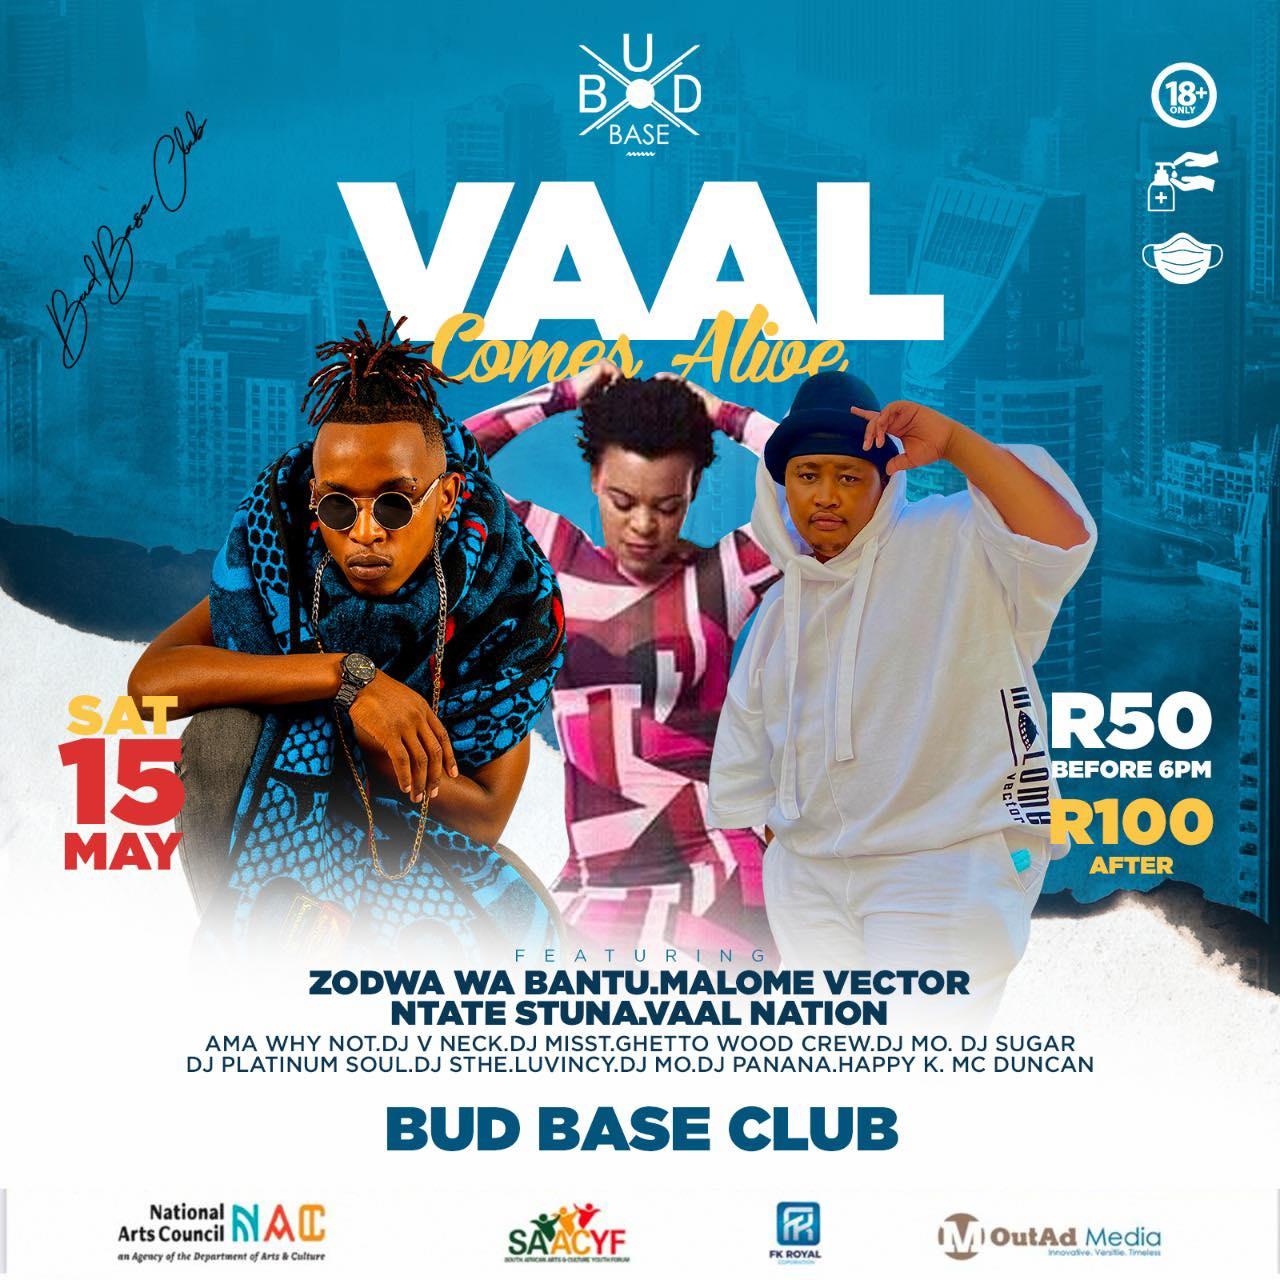 Vaal comes alive2